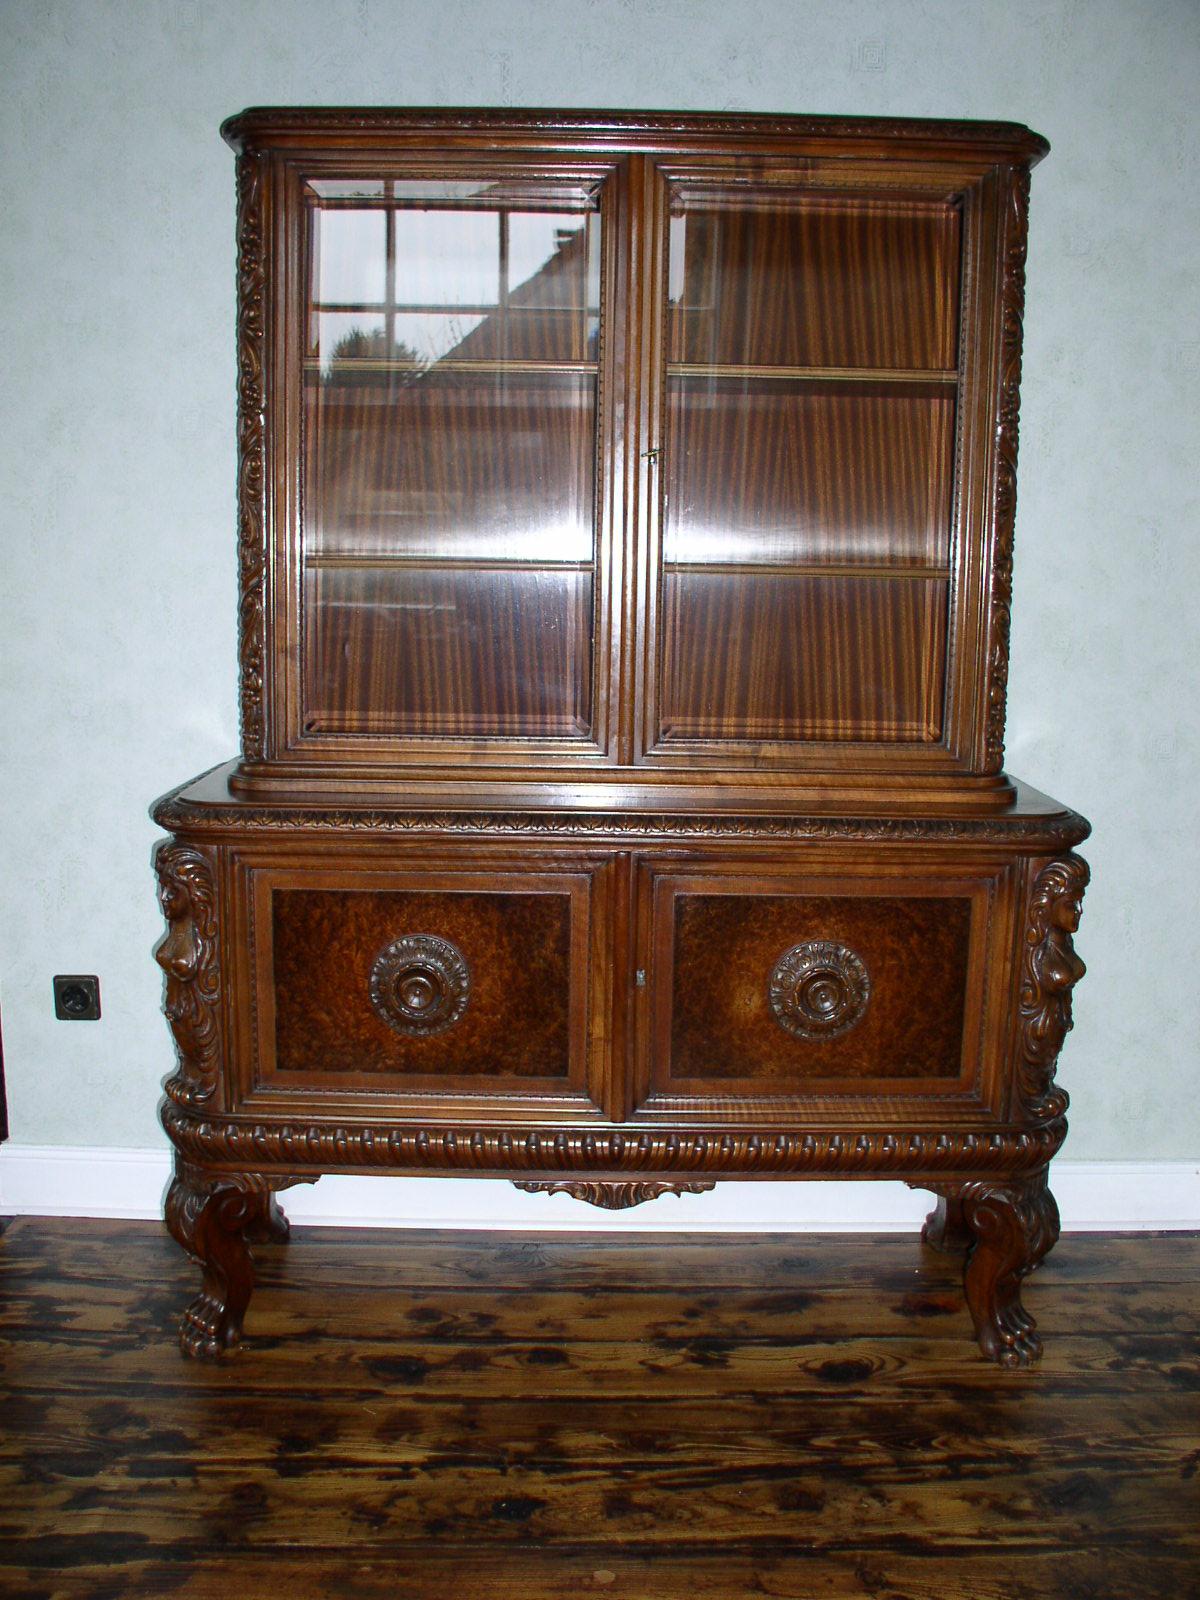 Vintage Furniture Glass Living Room Showcase Design Wood: Antique Living Room Set From Germany Around 1900